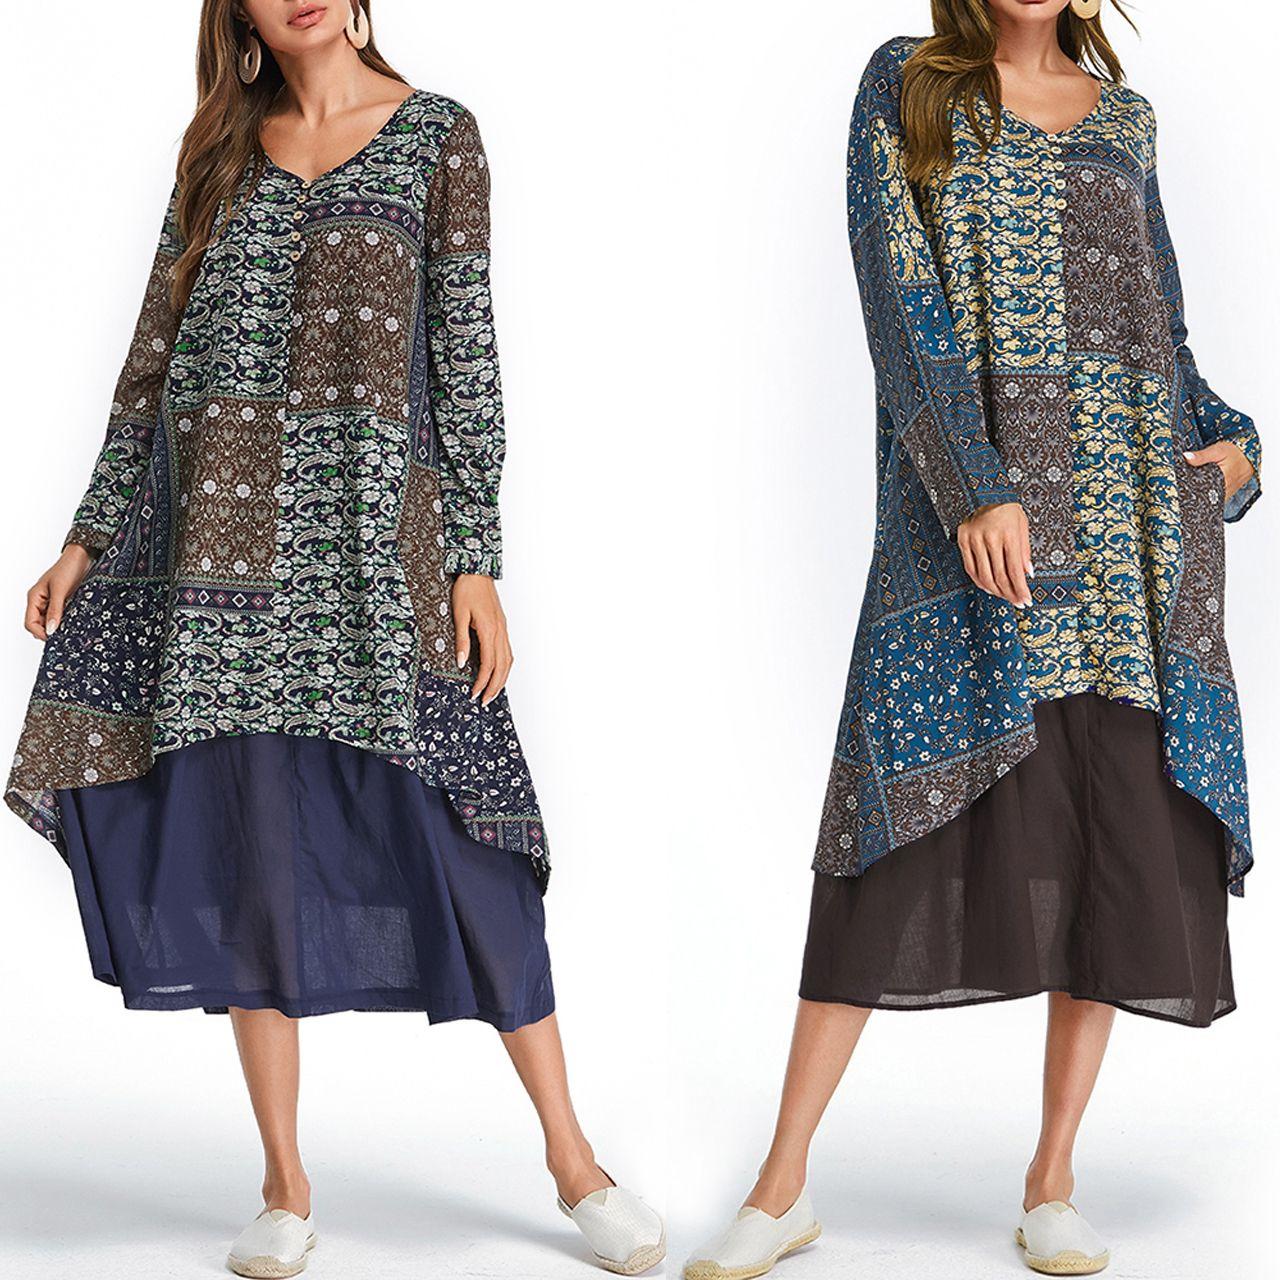 Vintage Floral Print Patchwork Long Sleeve Dress With Pockets Plus Size Vintage Dresses Vintage Dresses Stylish Women Fashion [ 1280 x 1280 Pixel ]